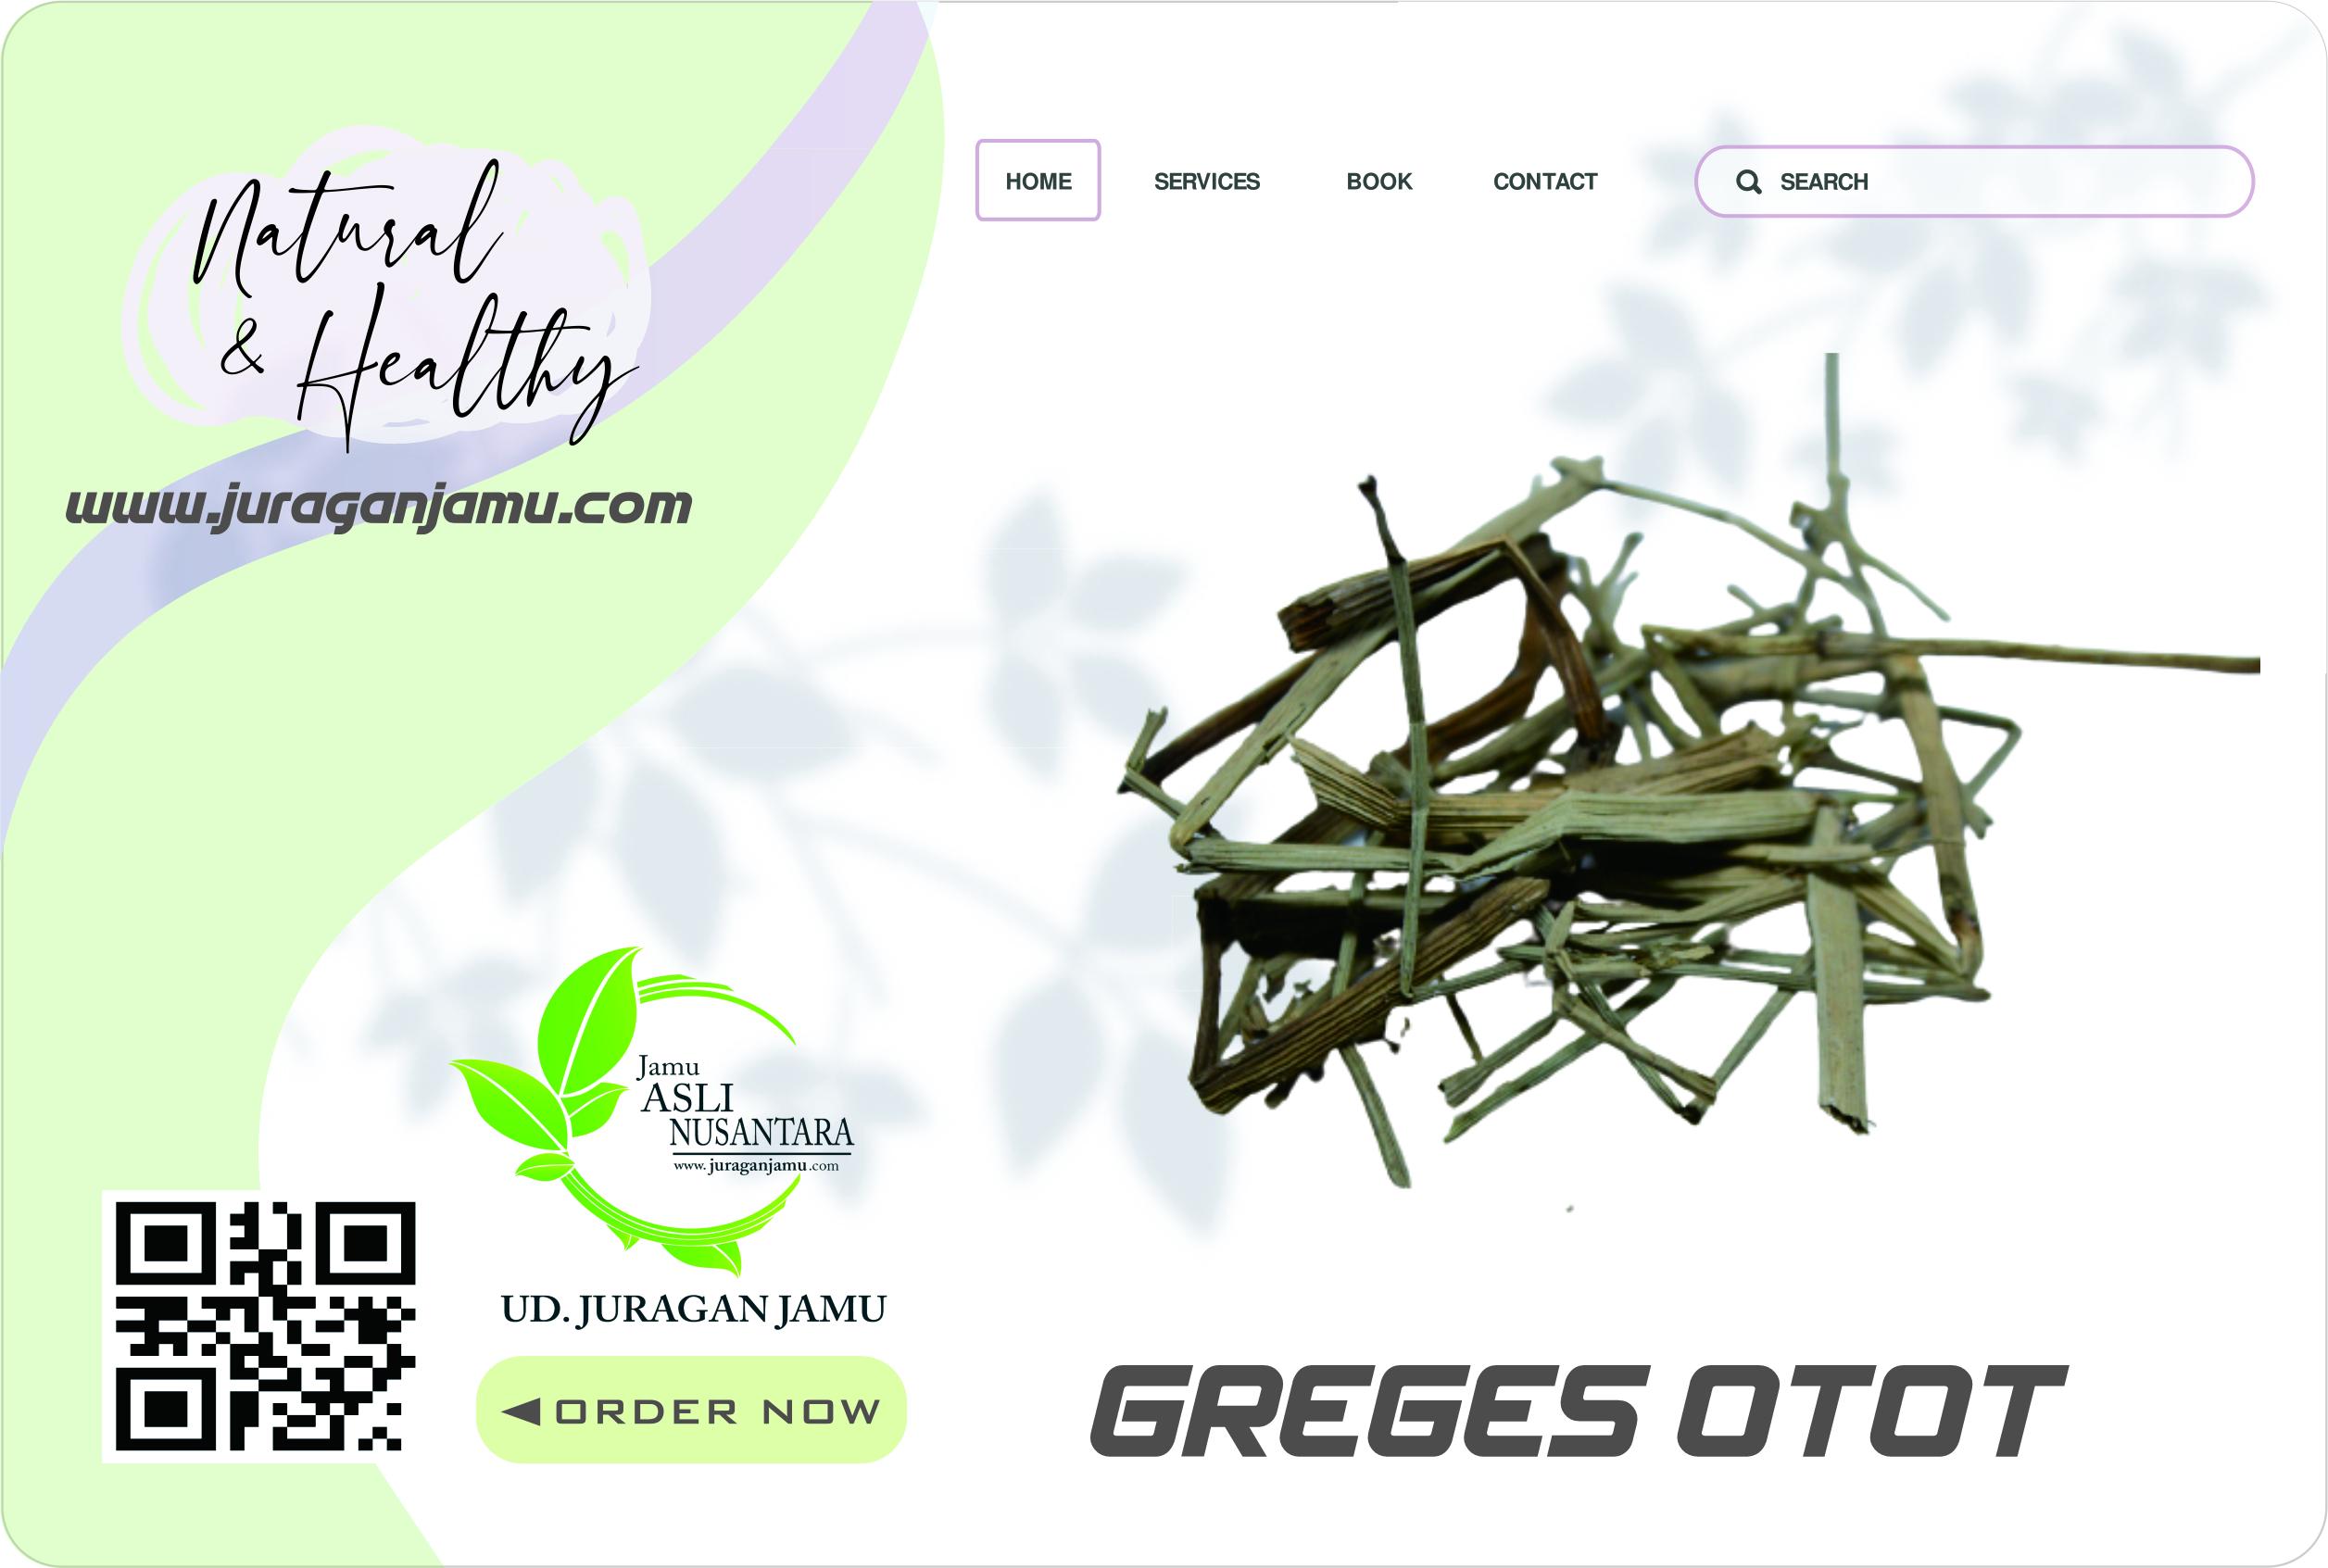 Jual Greges Otot Harga Grosir